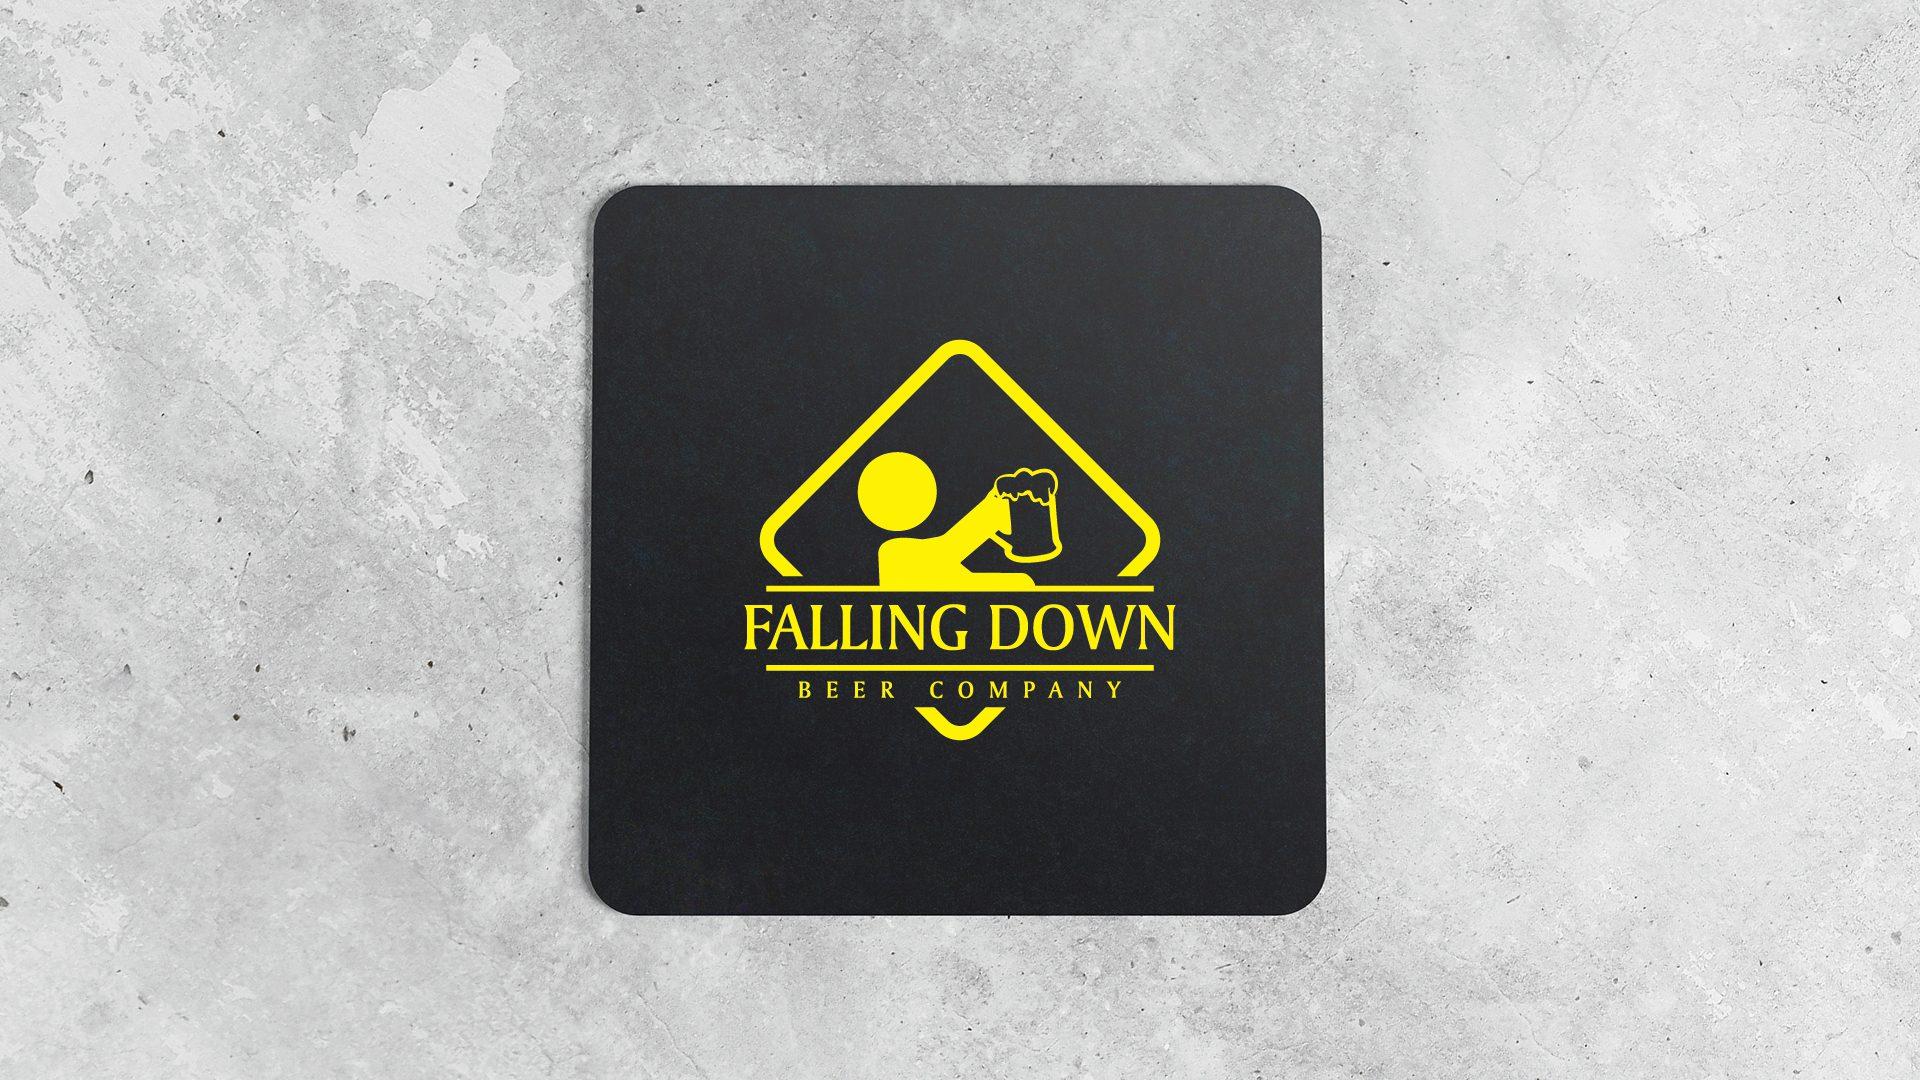 Falling Down Beer Company - Coasters Mockup 02